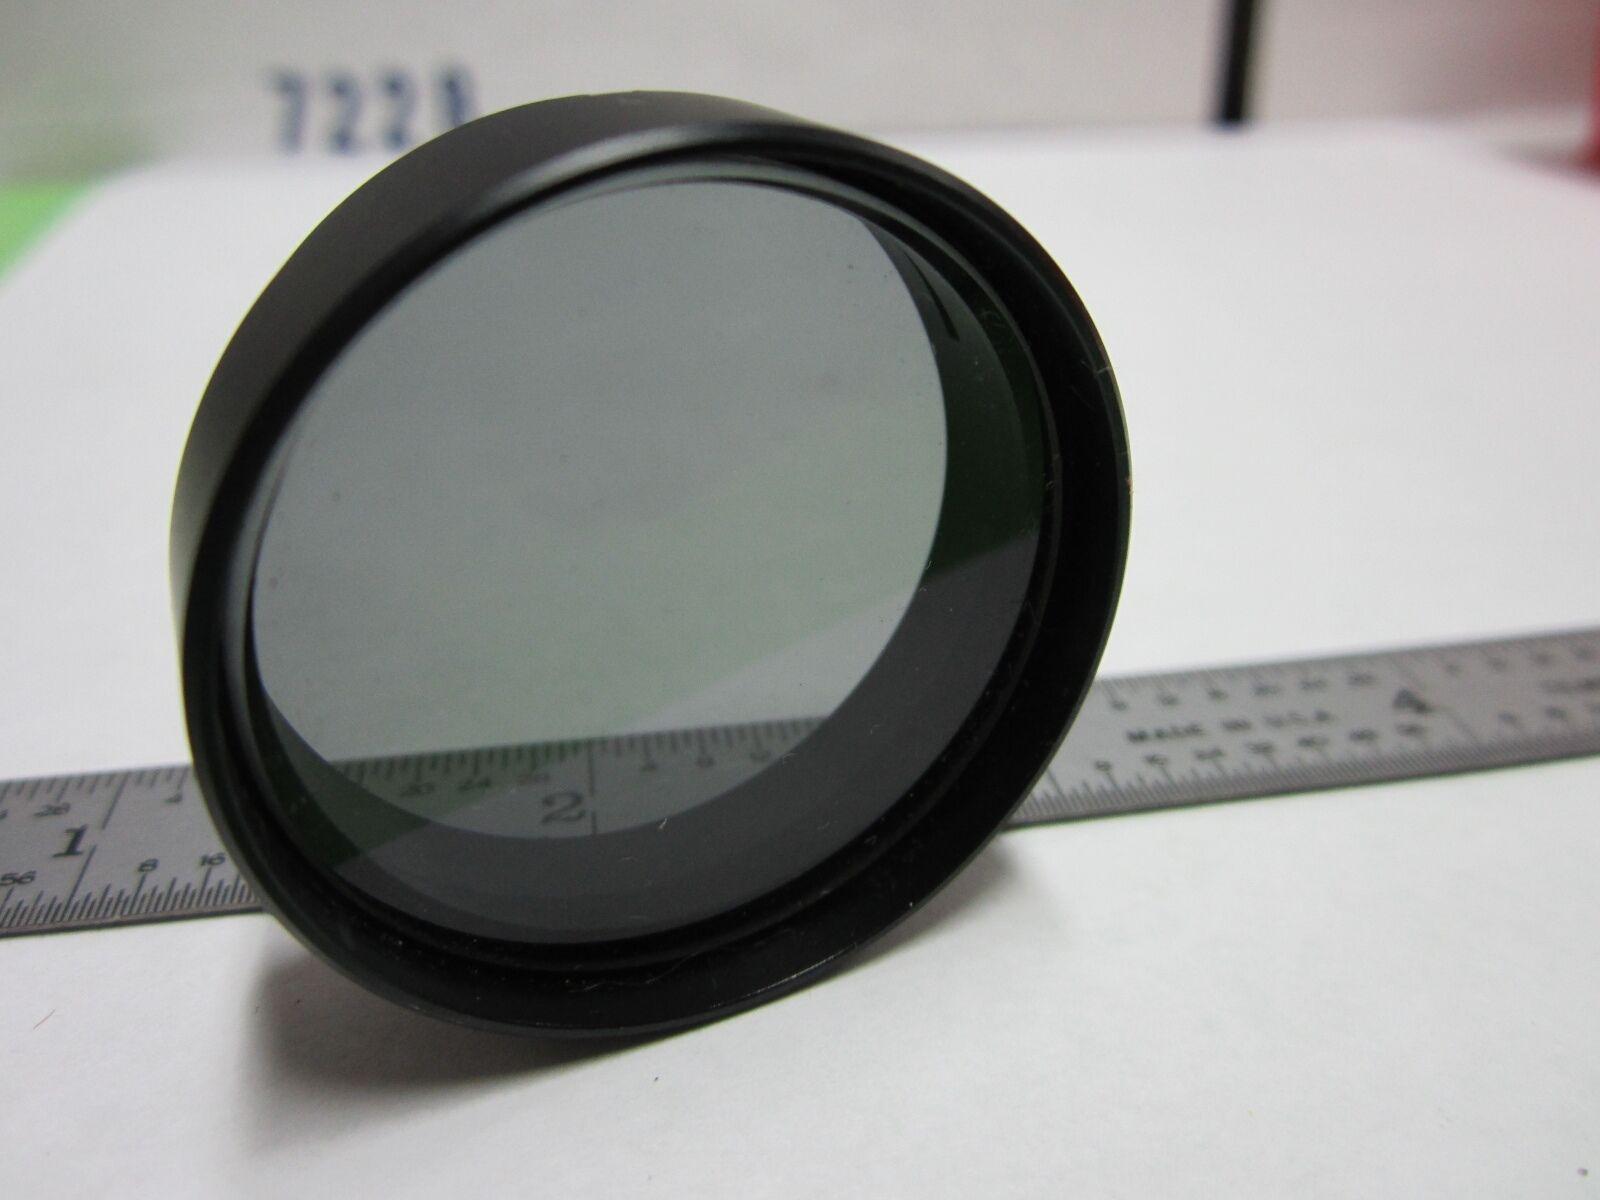 Microscopio Microscopio Microscopio óptico parte grandes Polarizador óptica BINQ9-32 17af74